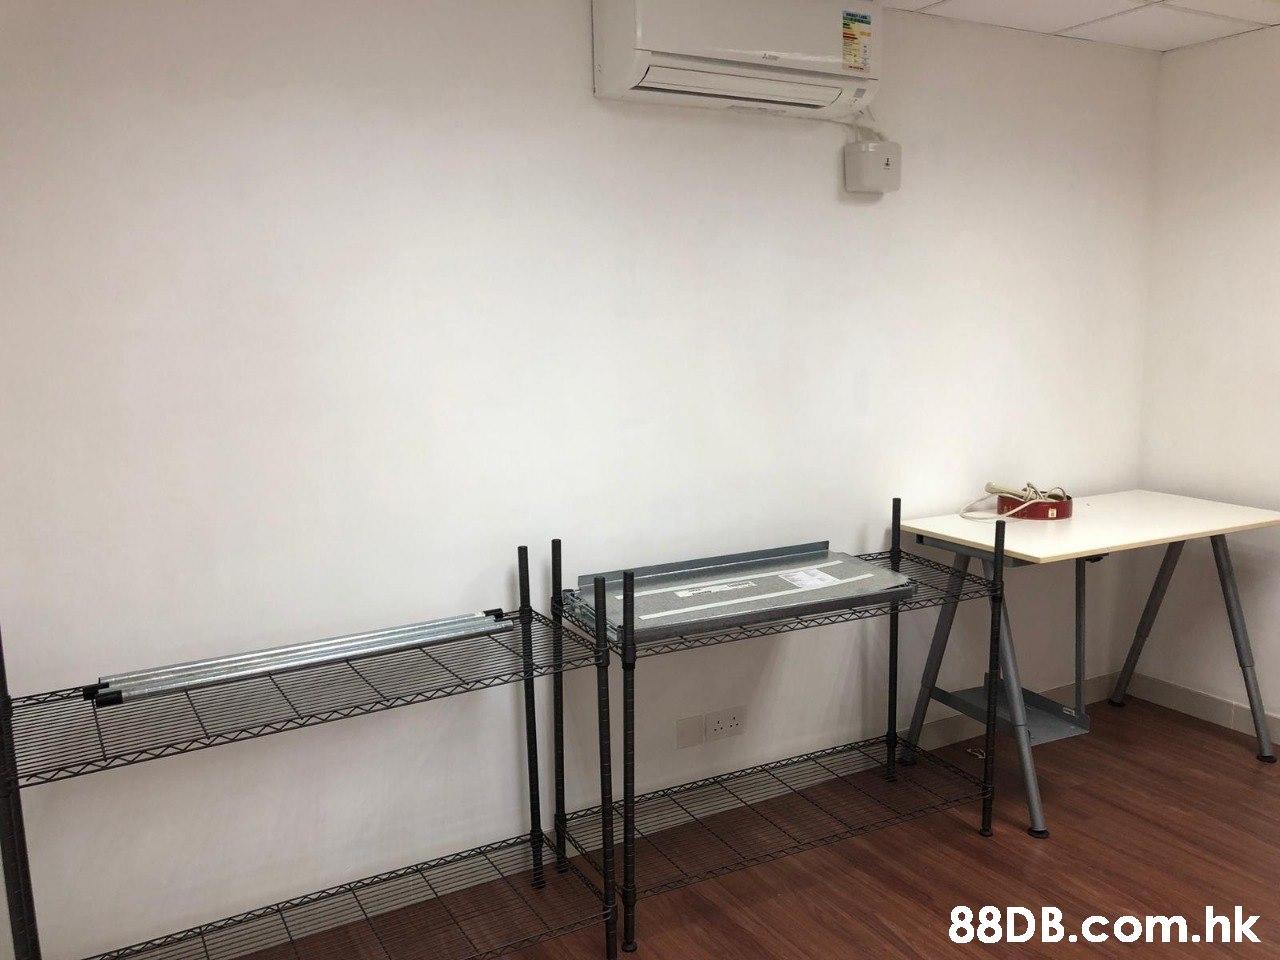 .hk  Room,Property,Furniture,Floor,Handrail